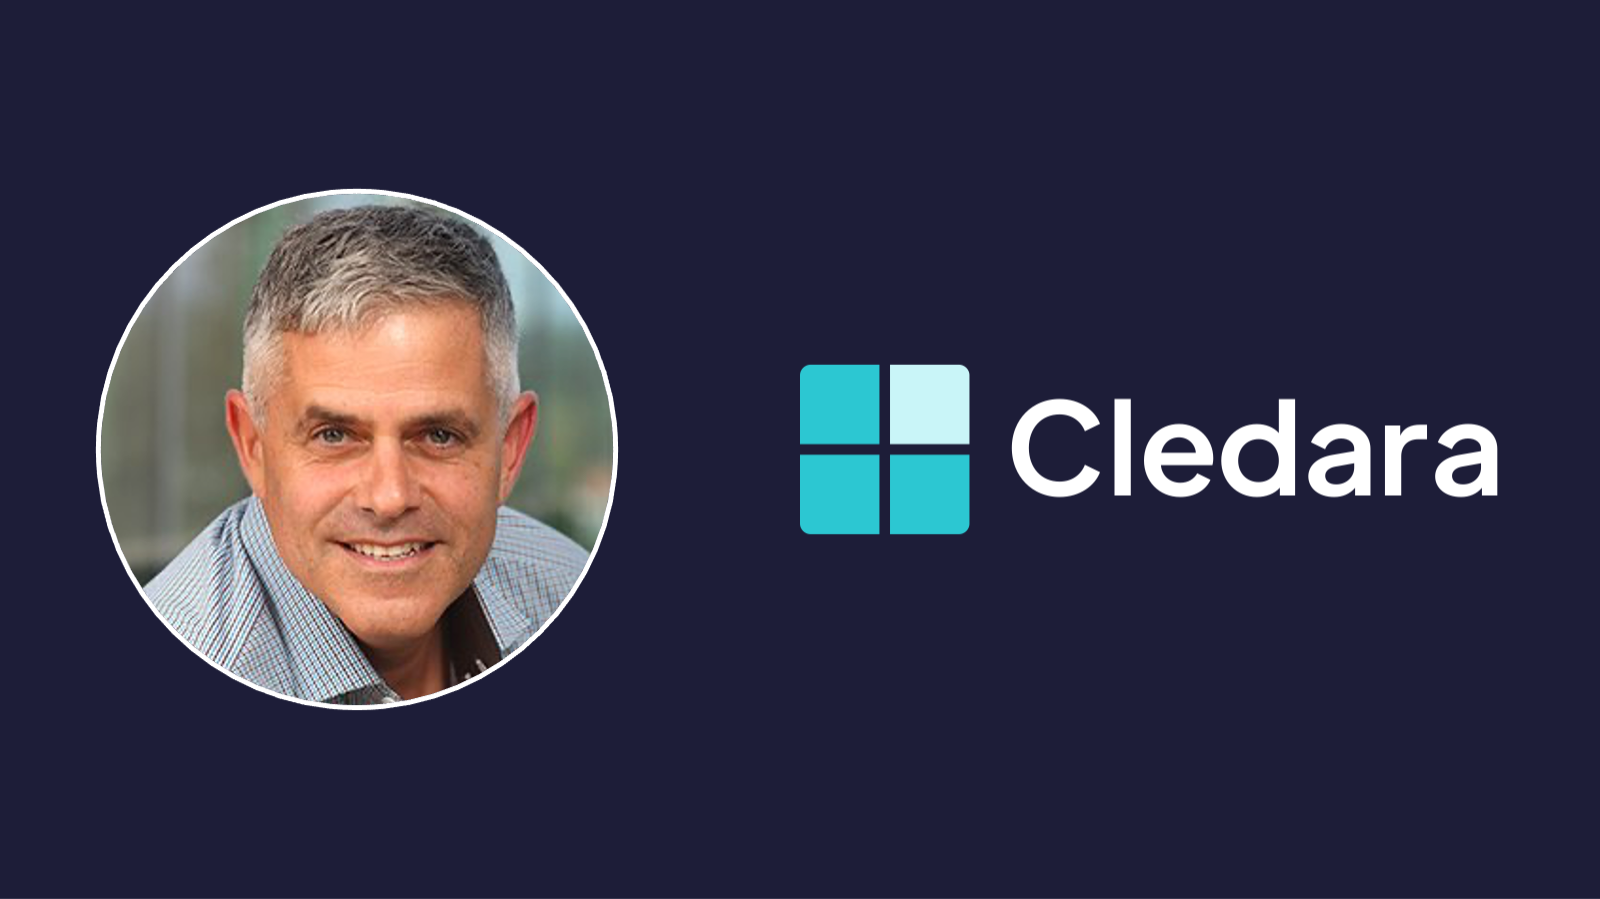 Former PayPal, SAP Cloud, Treasure Data Executive joins Cledara to Accelerate Adoption of their SaaS Management Platform